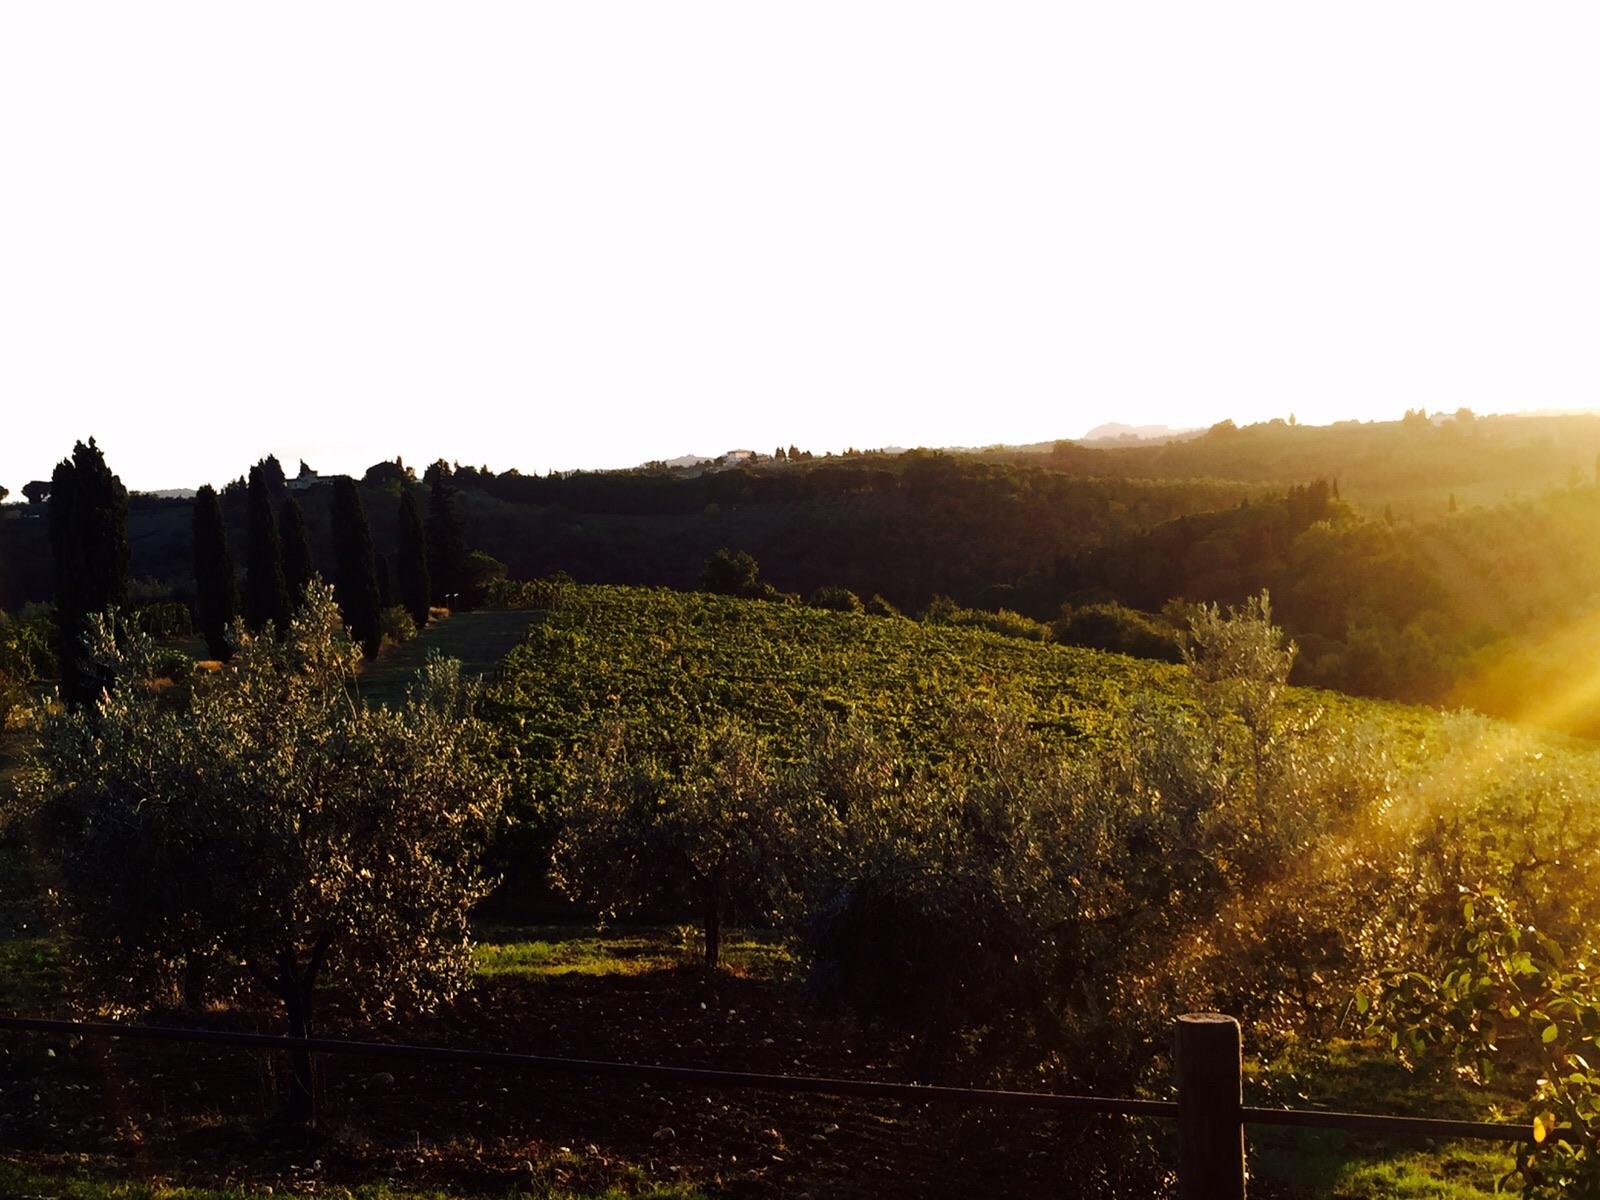 tuscan vineyards wine grapes wine tasting www.annakooiman.com Anna Kooiman Italy Chianti